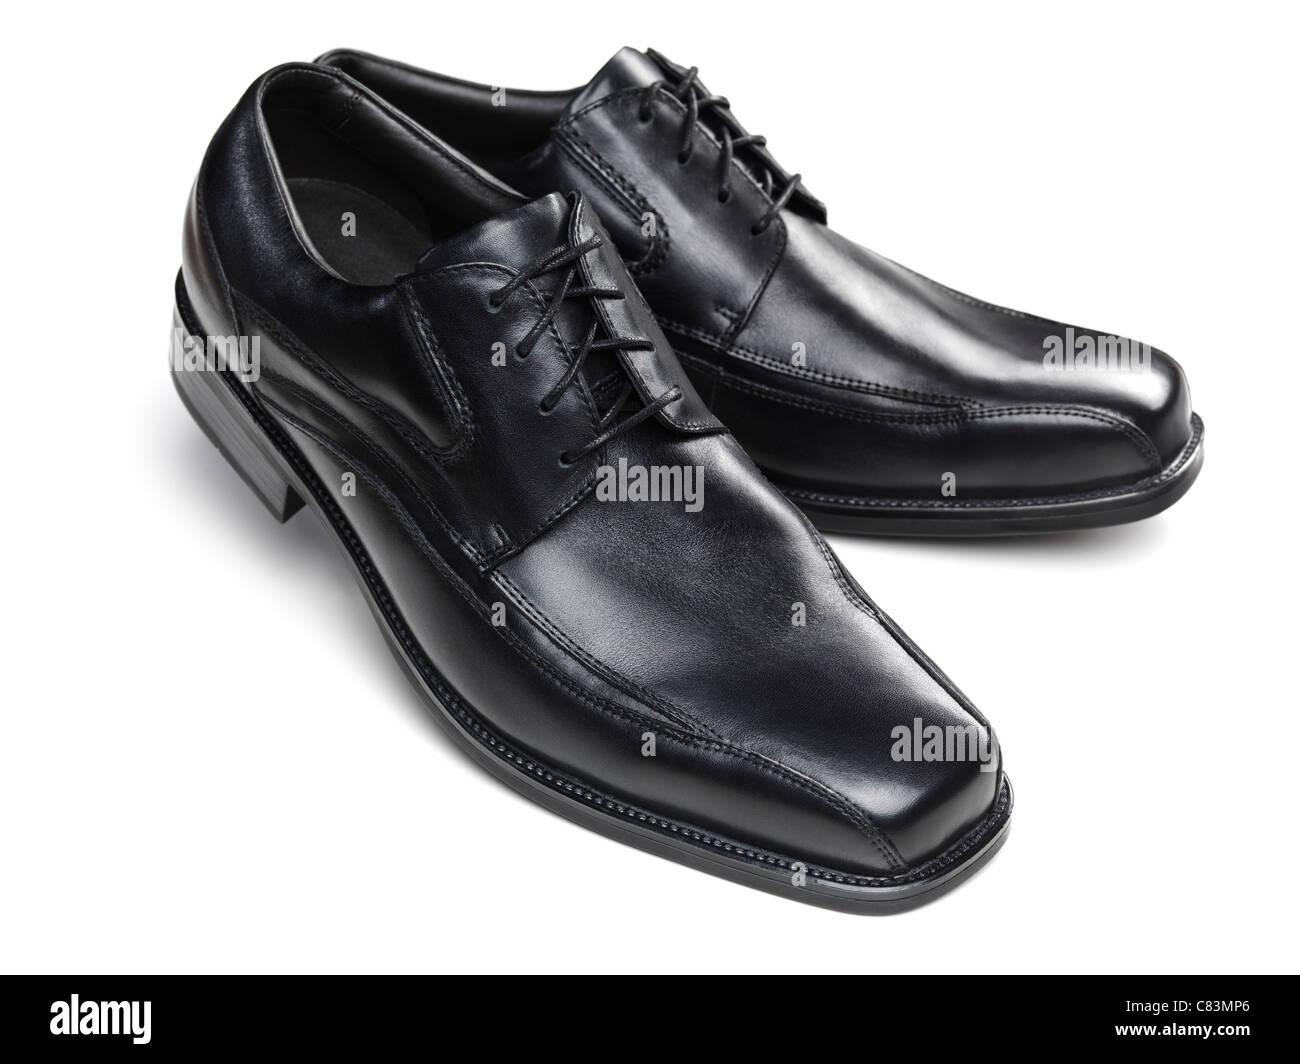 Par de zapatos de vestir mens negro aislado sobre fondo blanco. Imagen De Stock